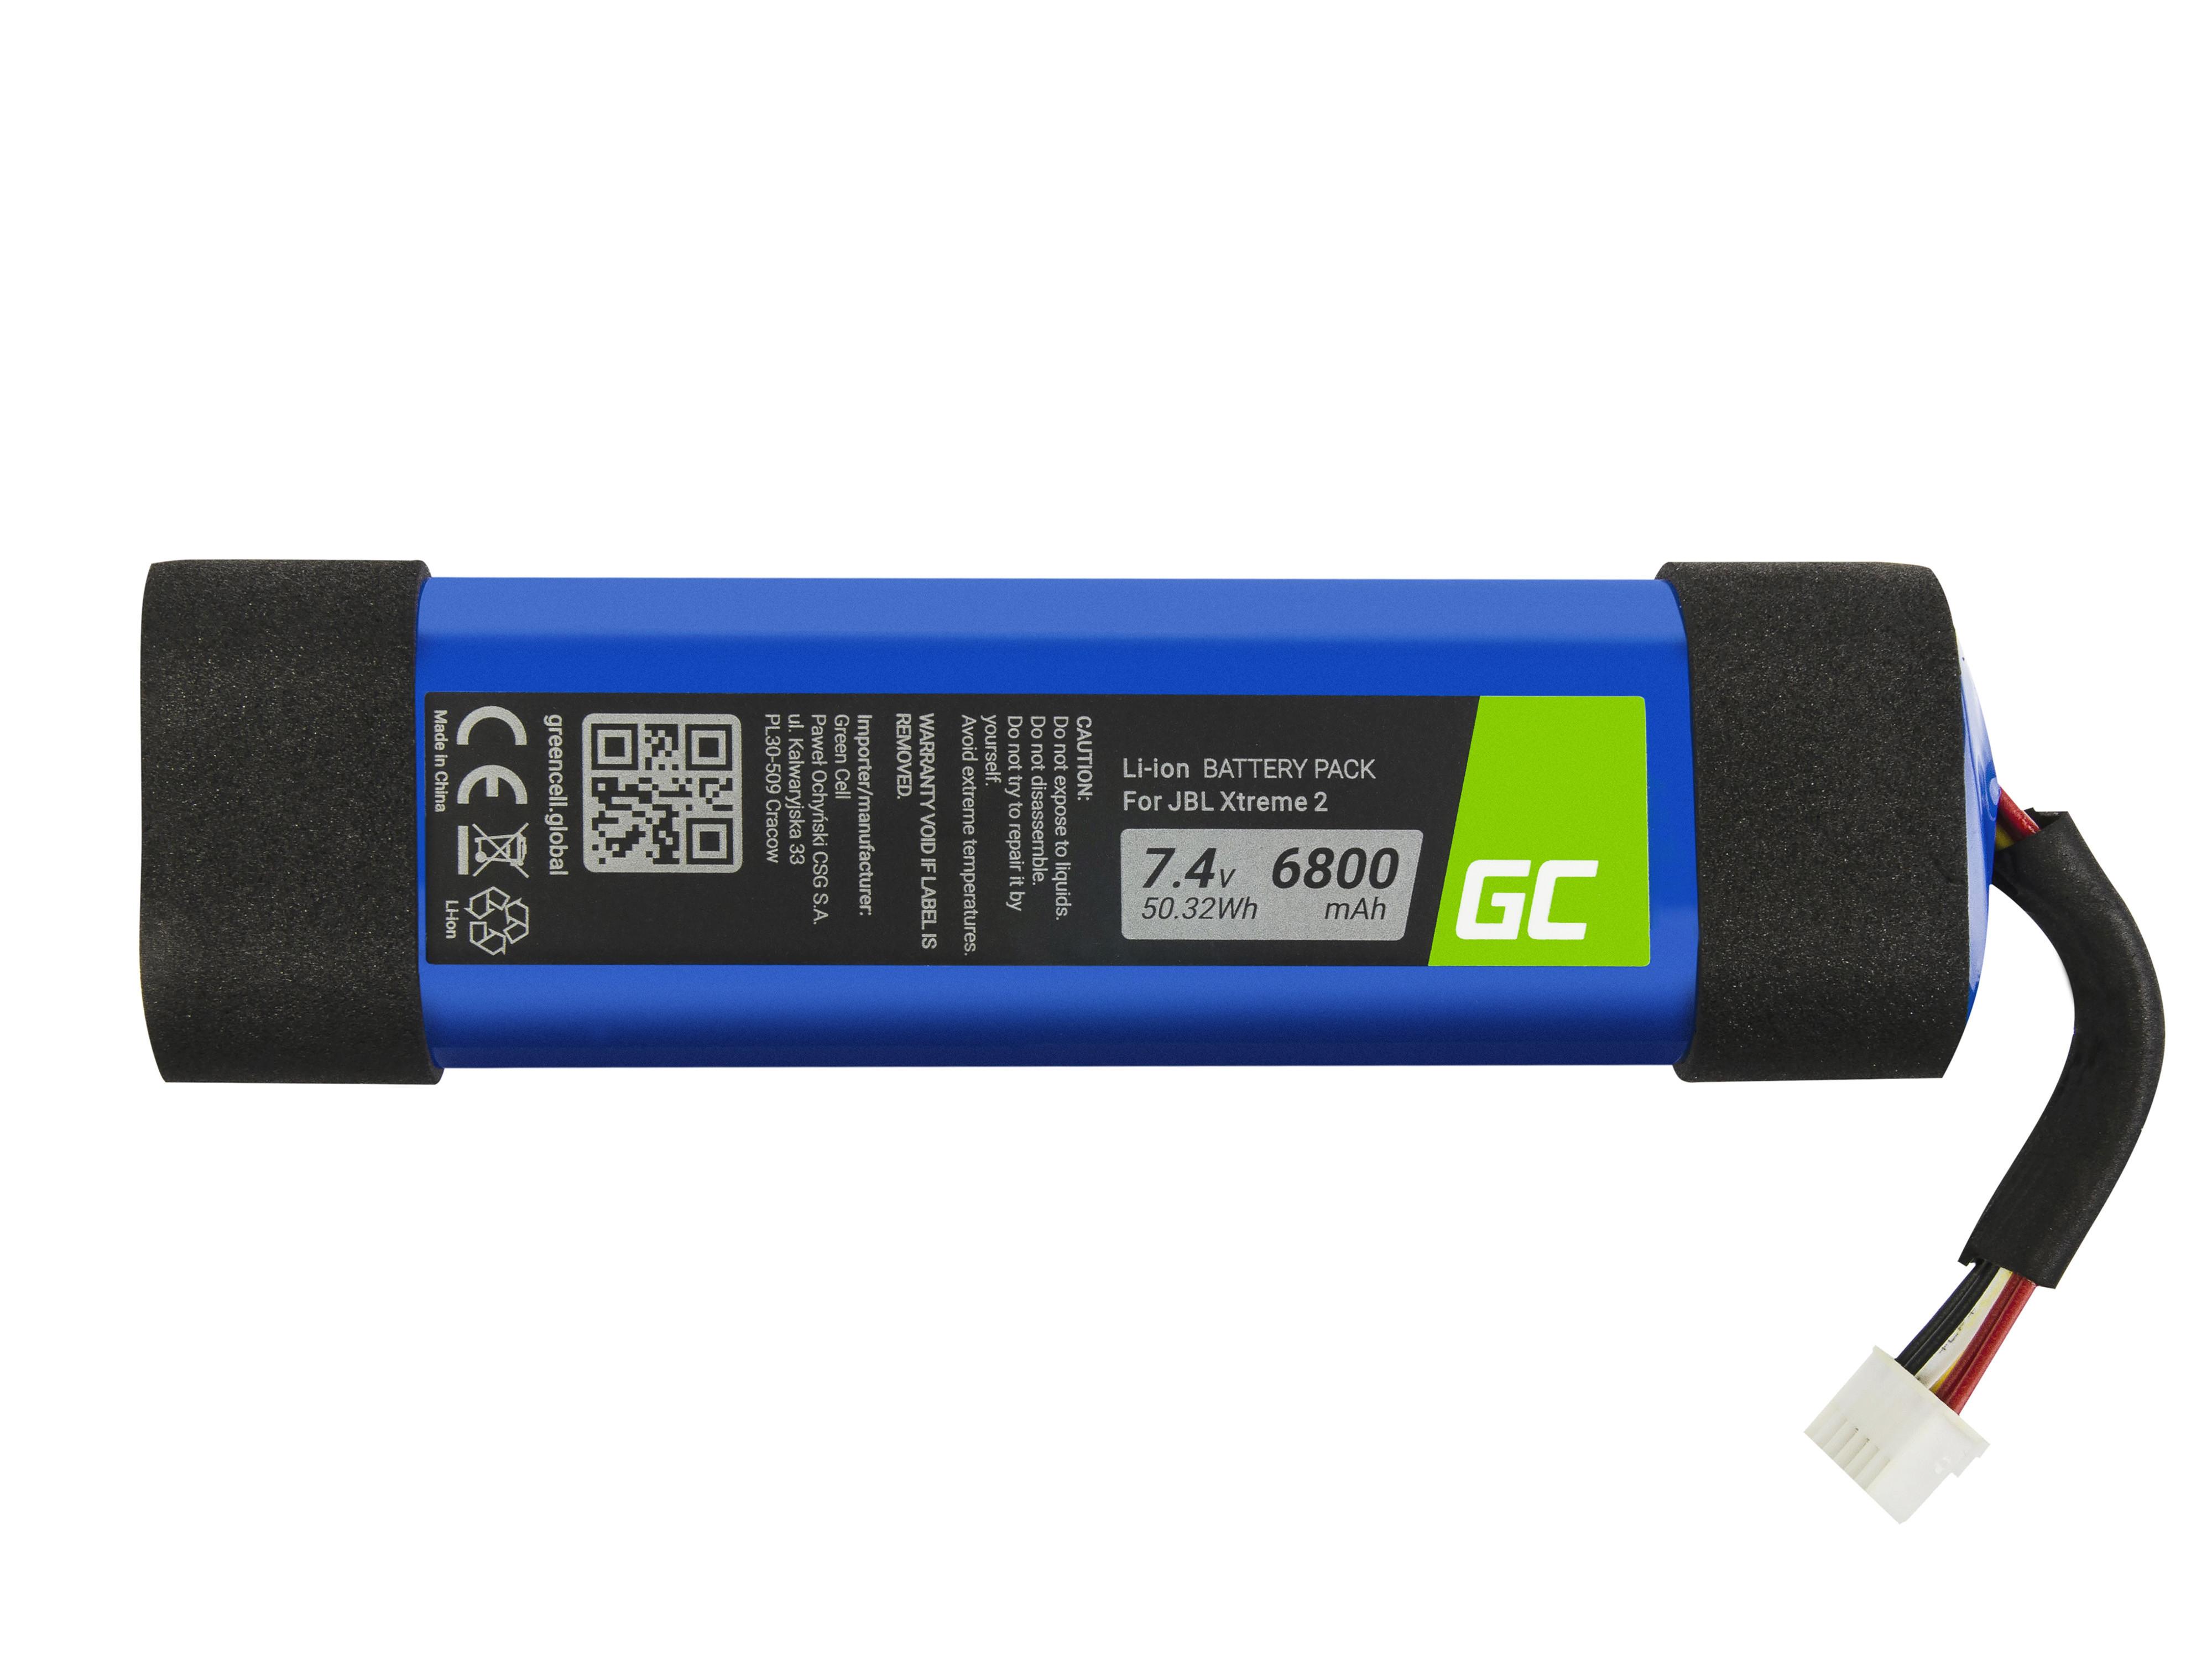 Baterie Green Cell pro JBL 2INR19/66-2,JBL Xtreme 2 6800mAh Li-Ion – neoriginální